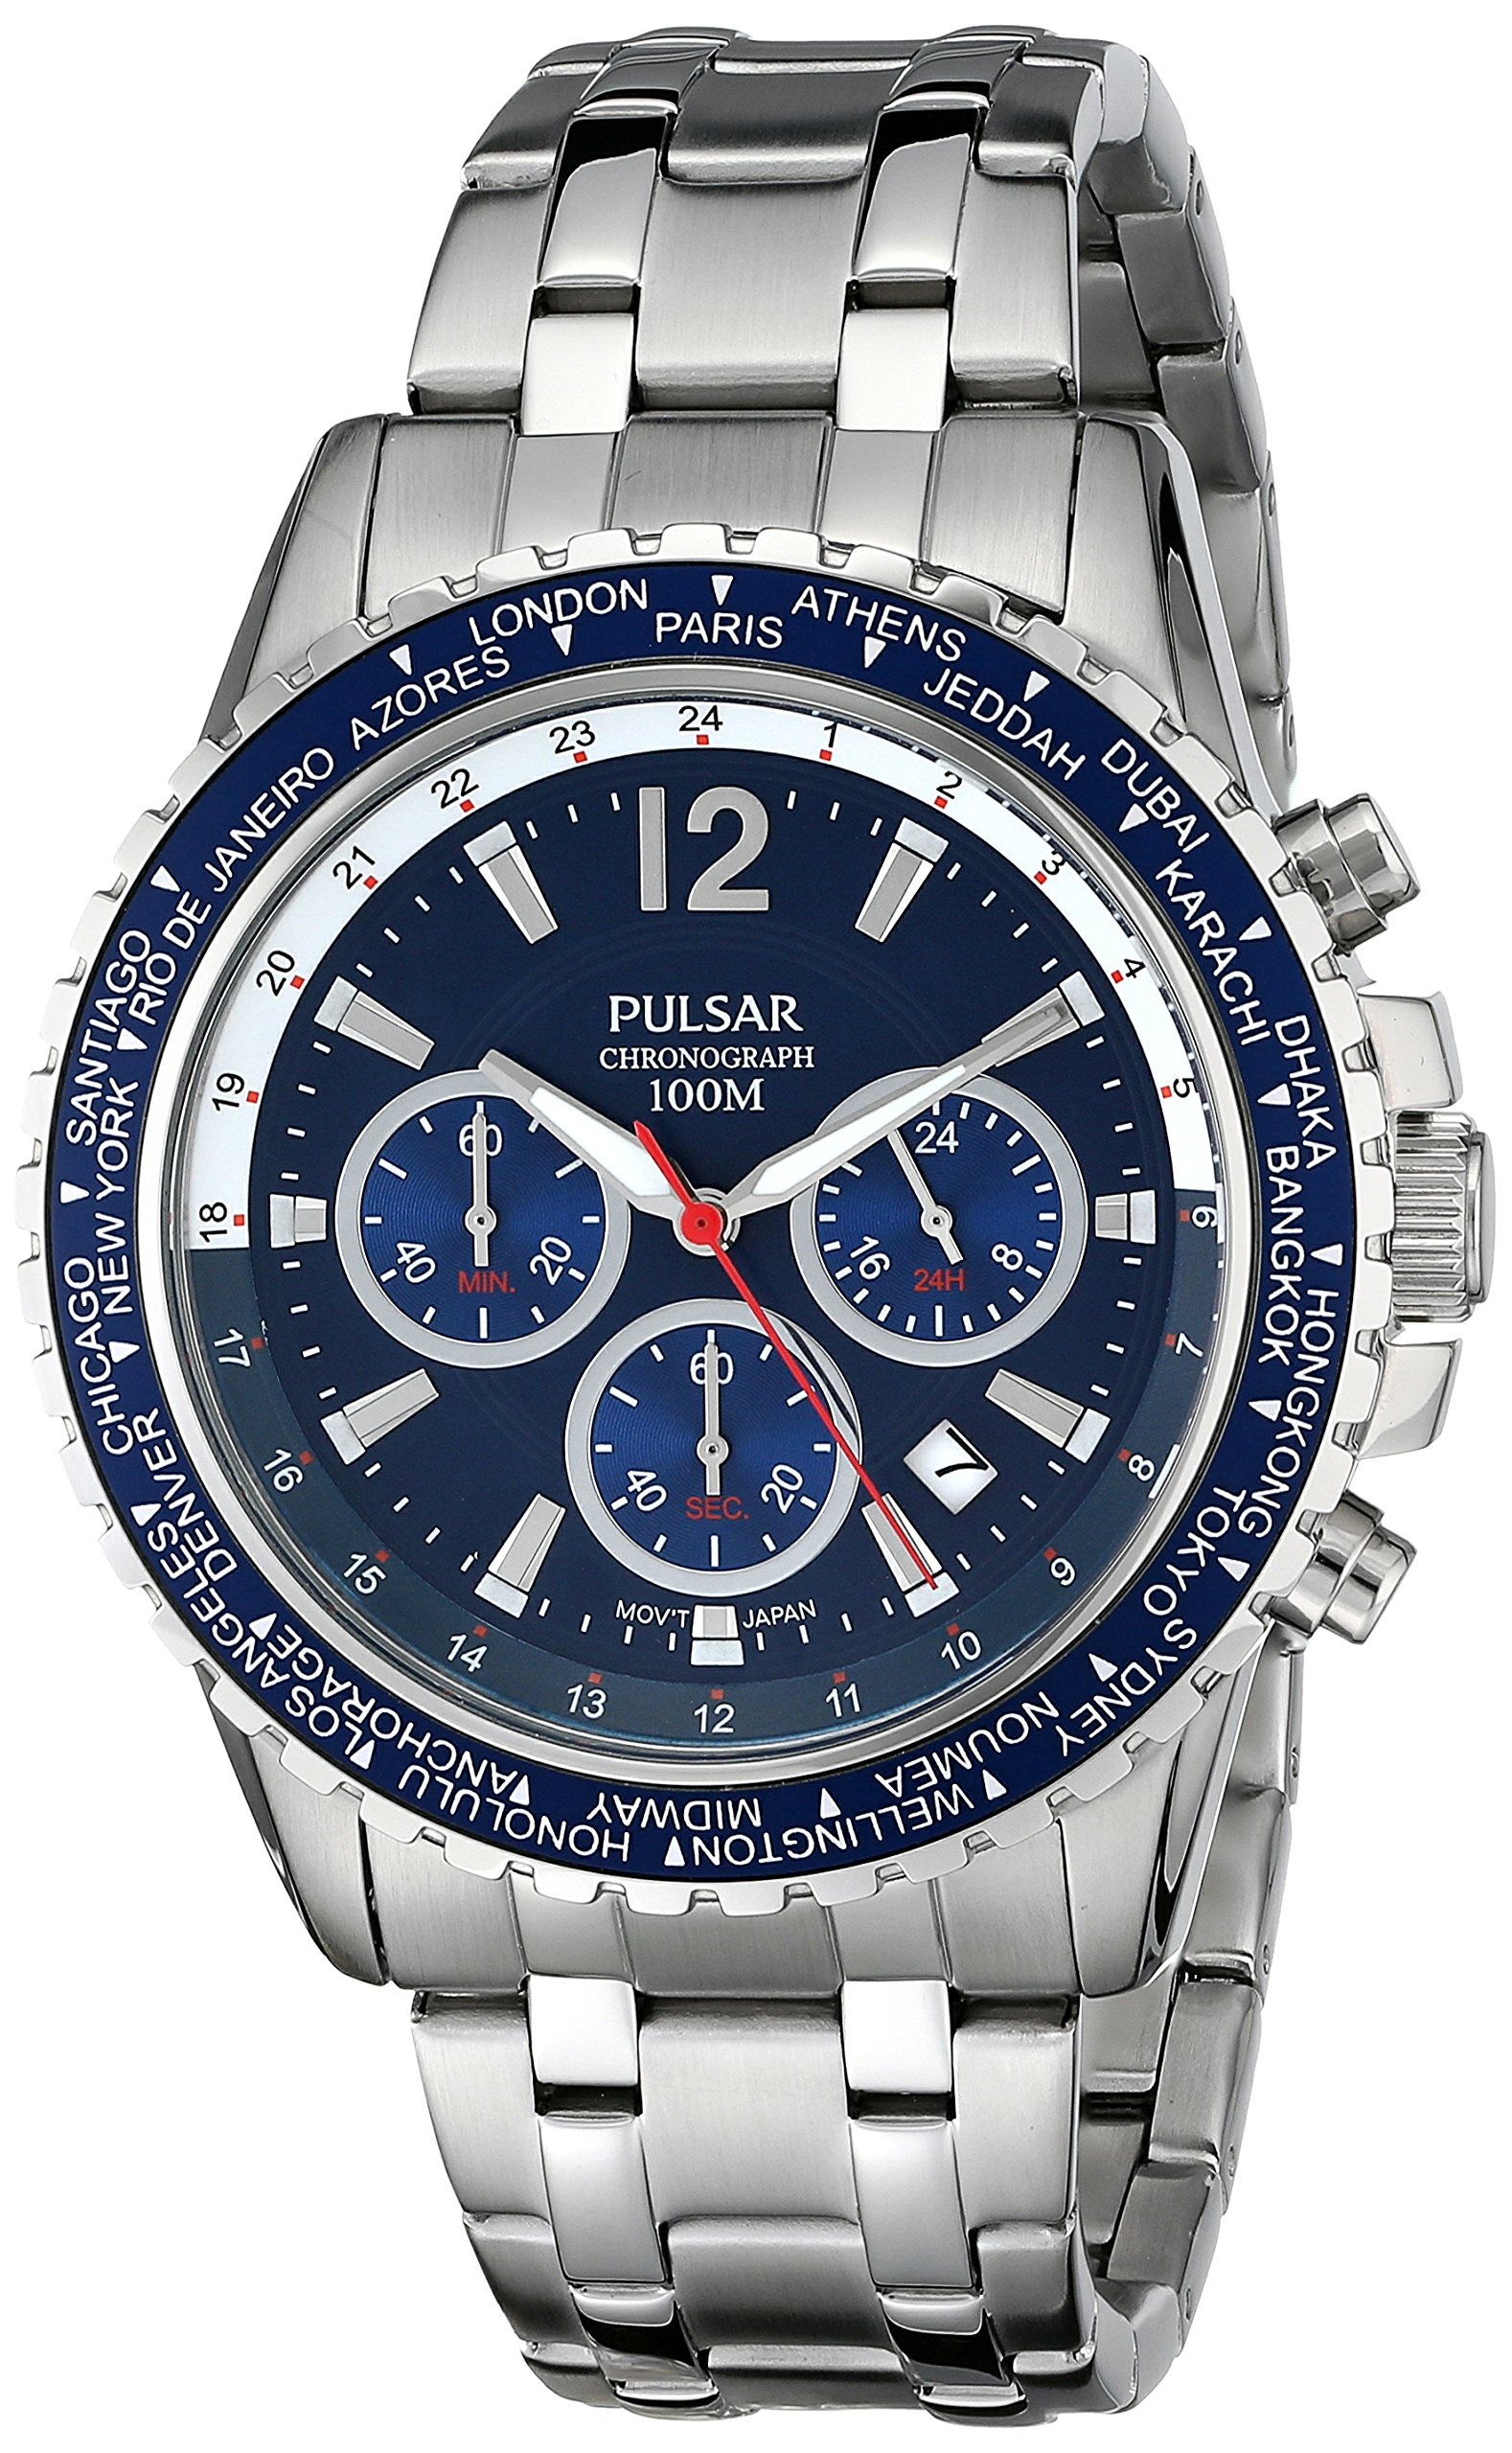 Pulsar Men's PT3579 Analog Display Japanese Quartz Silver-Tone Watch by Pulsar